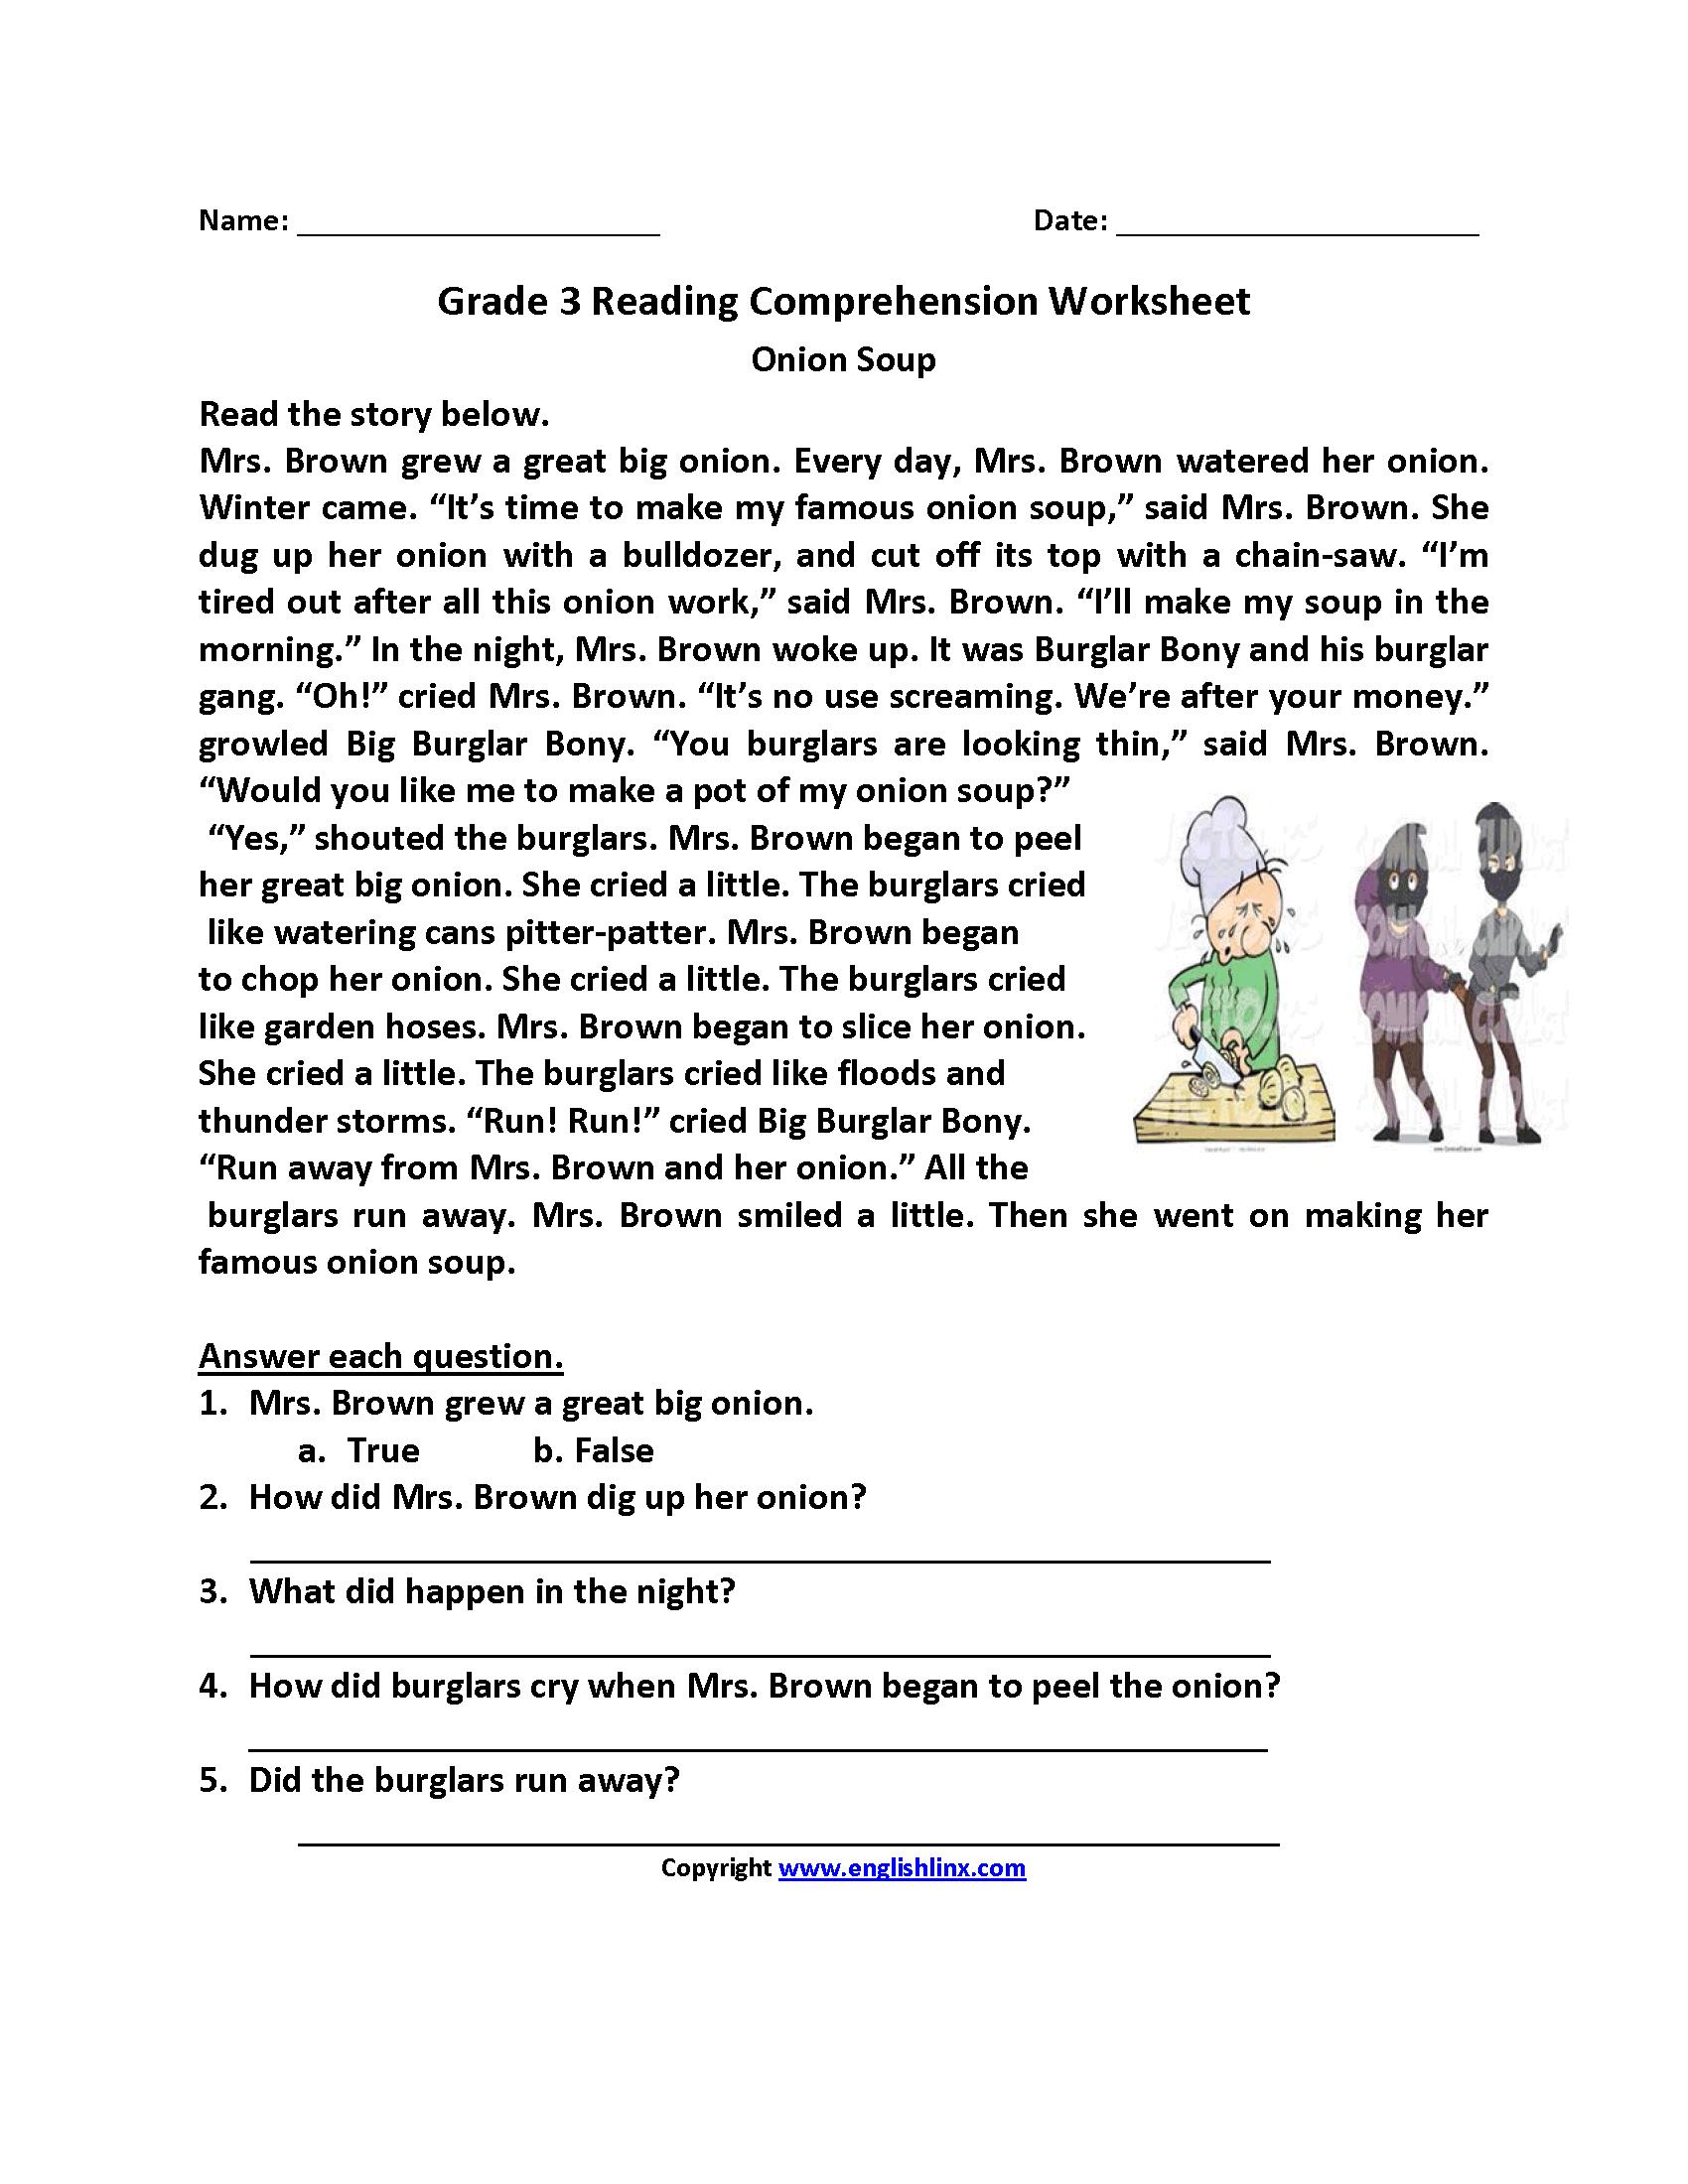 Reading Worksheets | Third Grade Reading Worksheets - Third Grade Reading Worksheets Free Printable